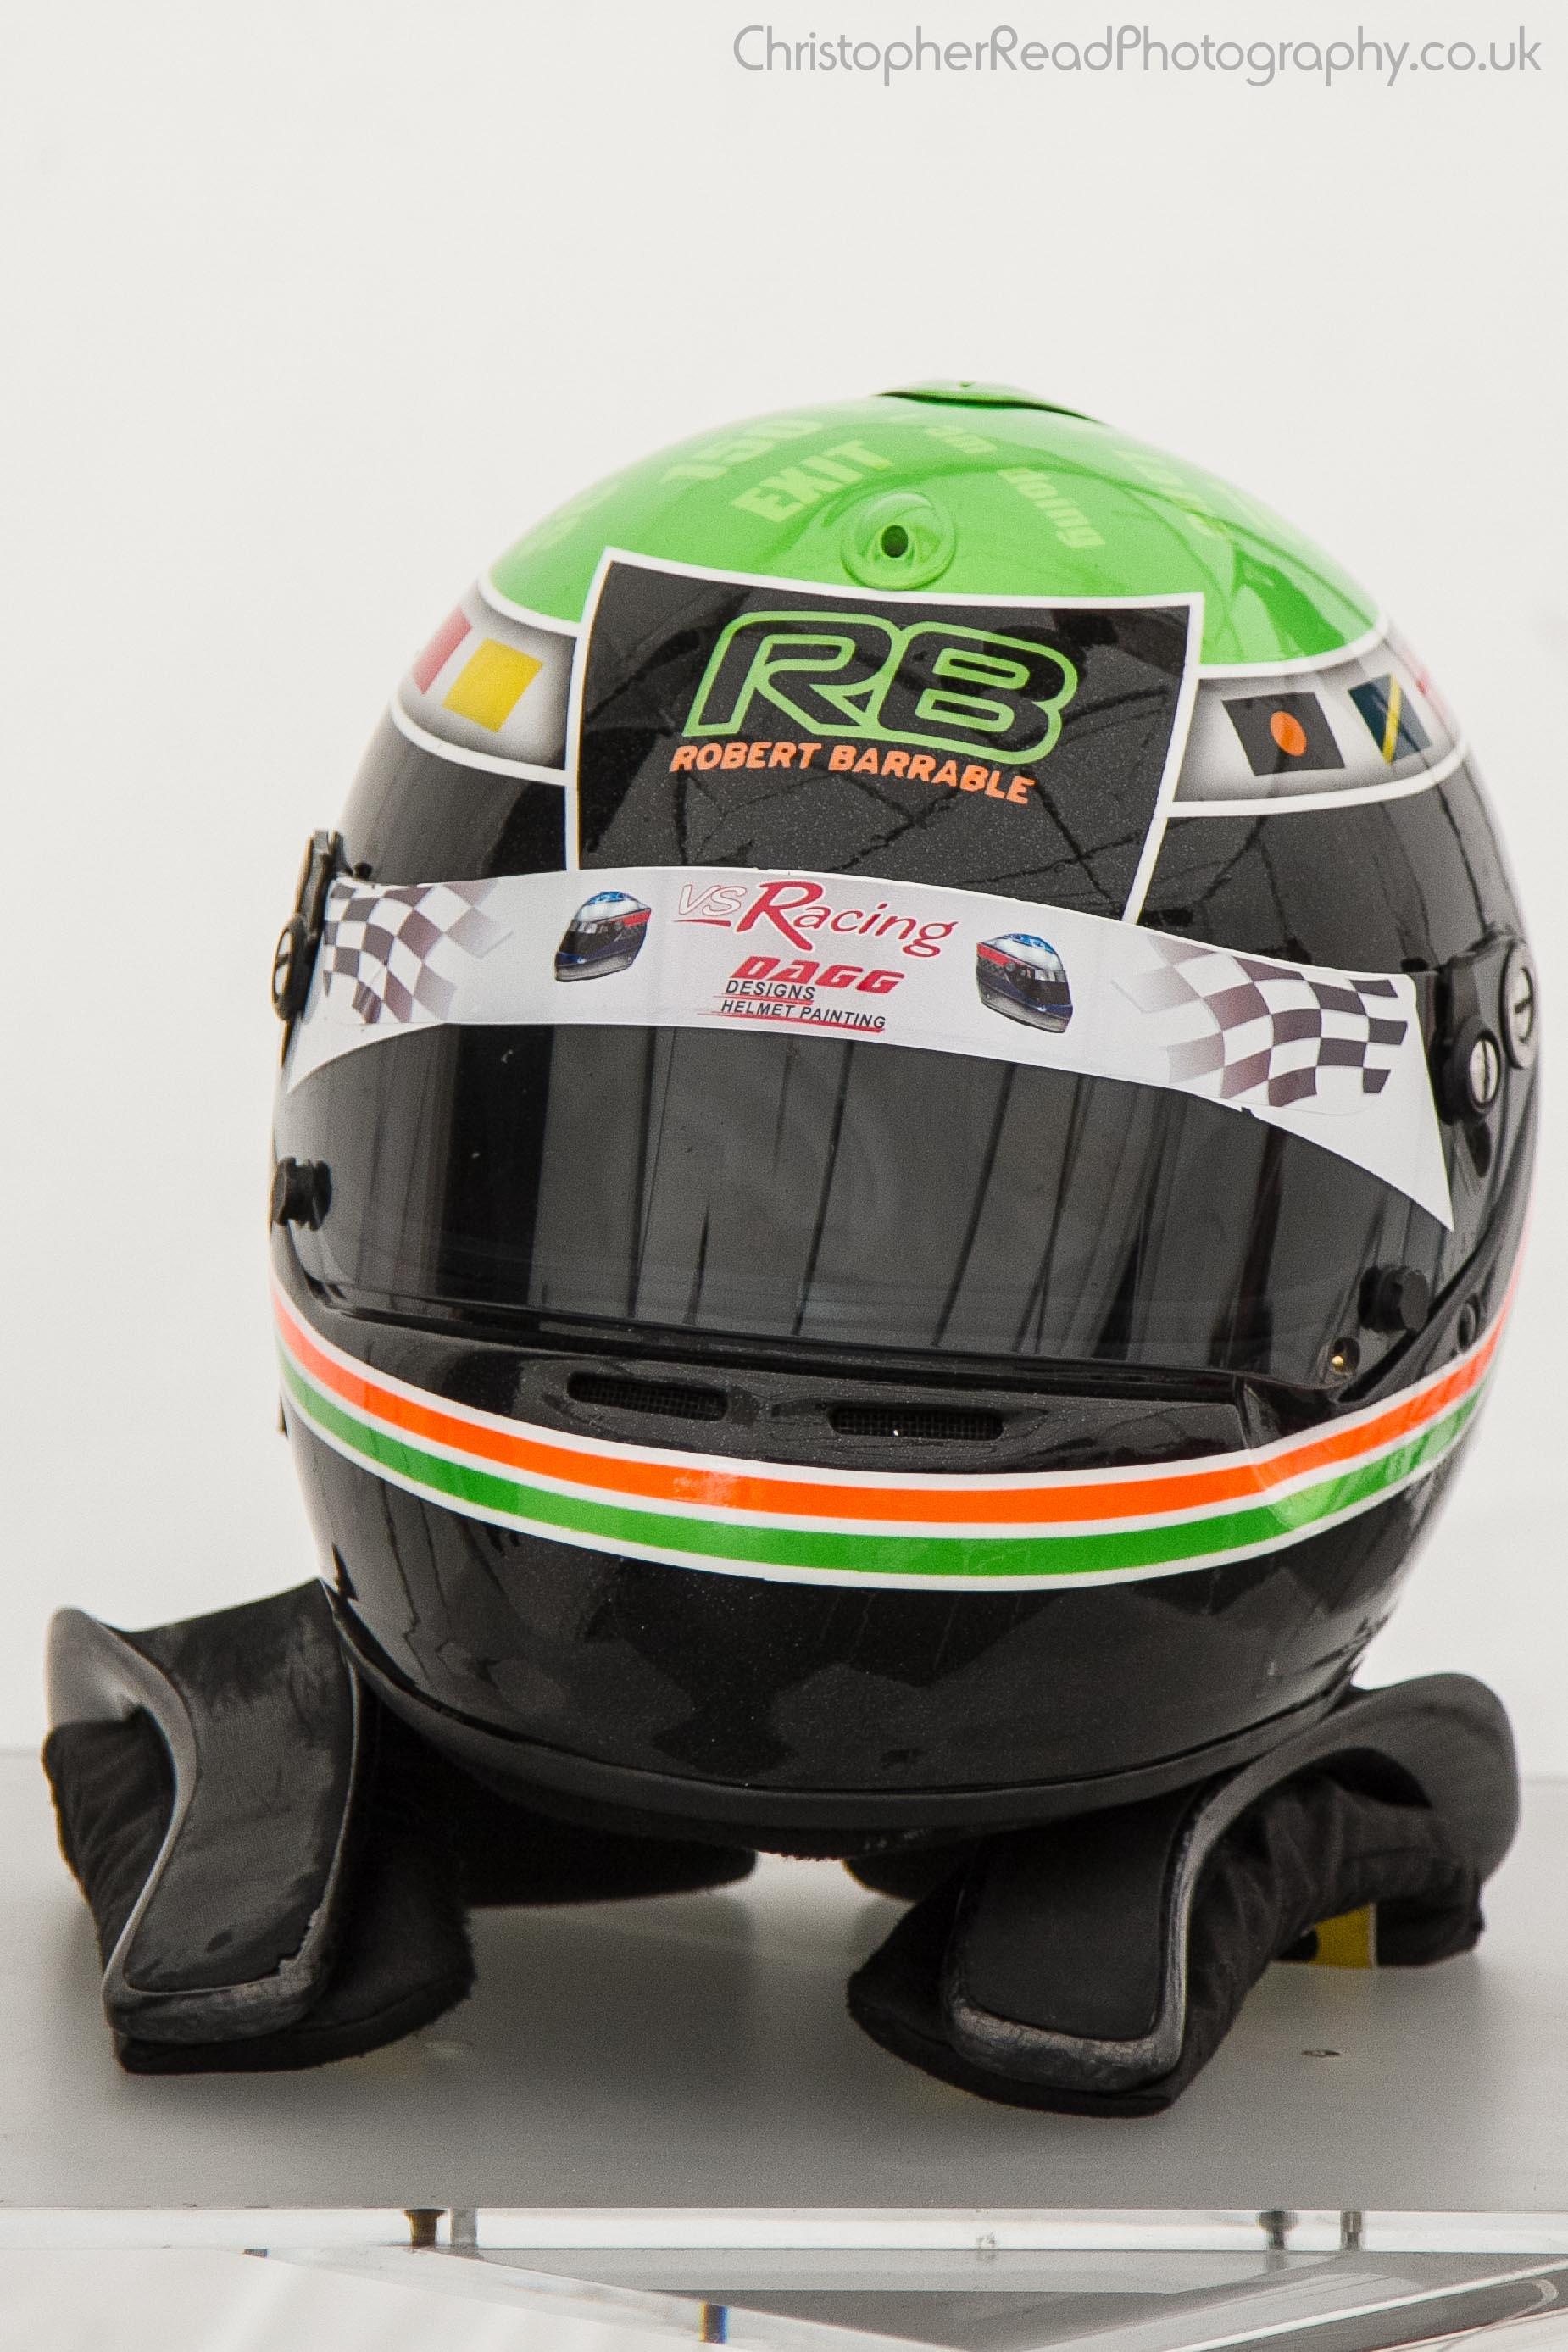 THM Racing - Robert Barrable's crash helmet